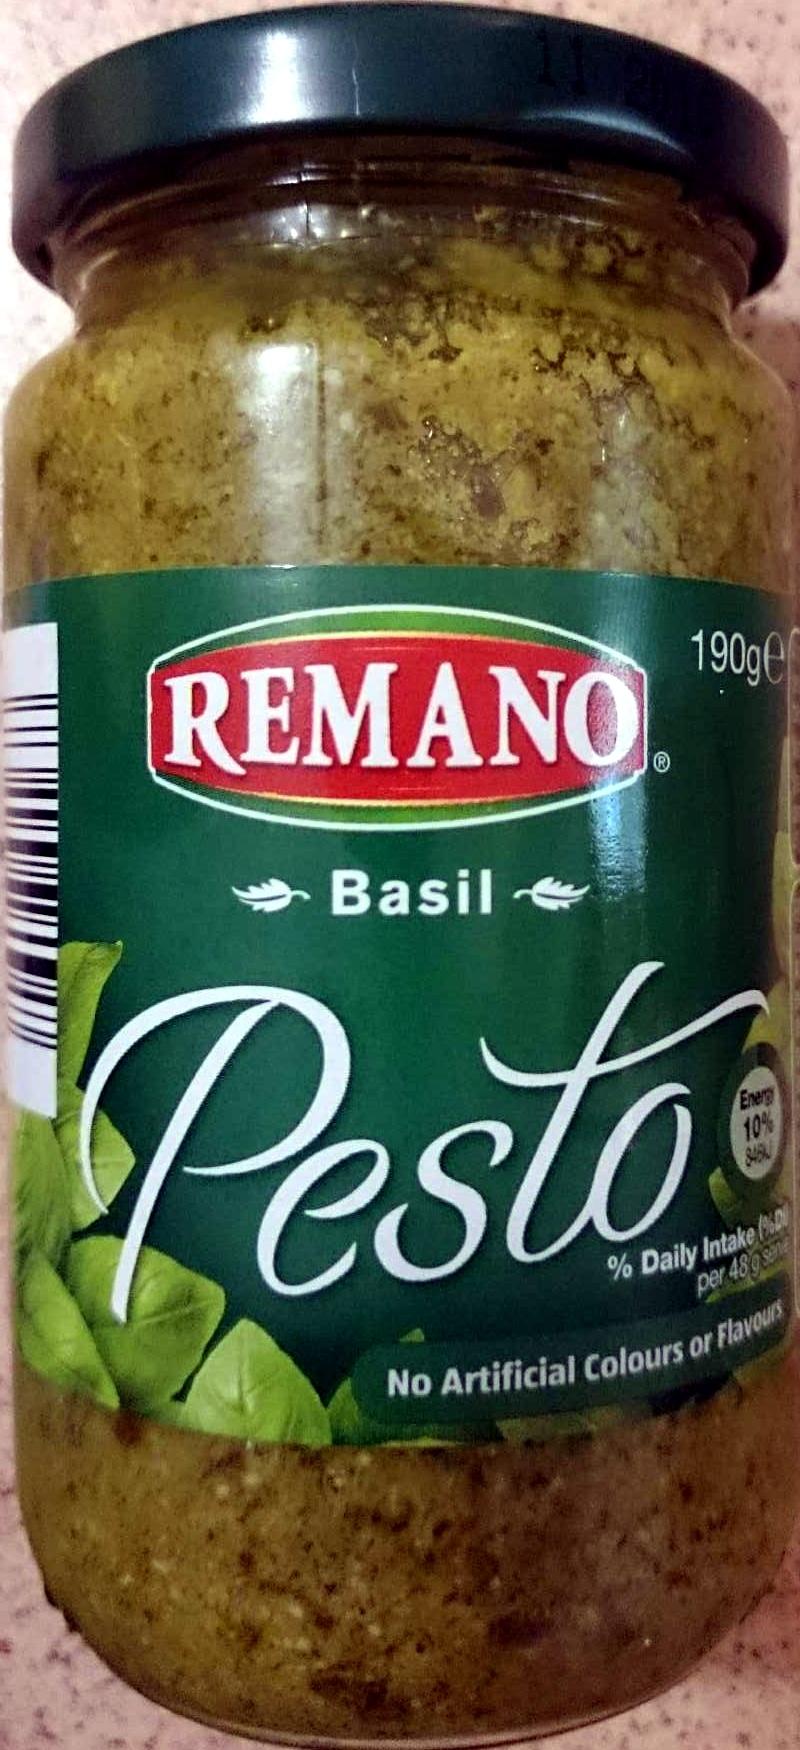 Basil Pesto - Product - en